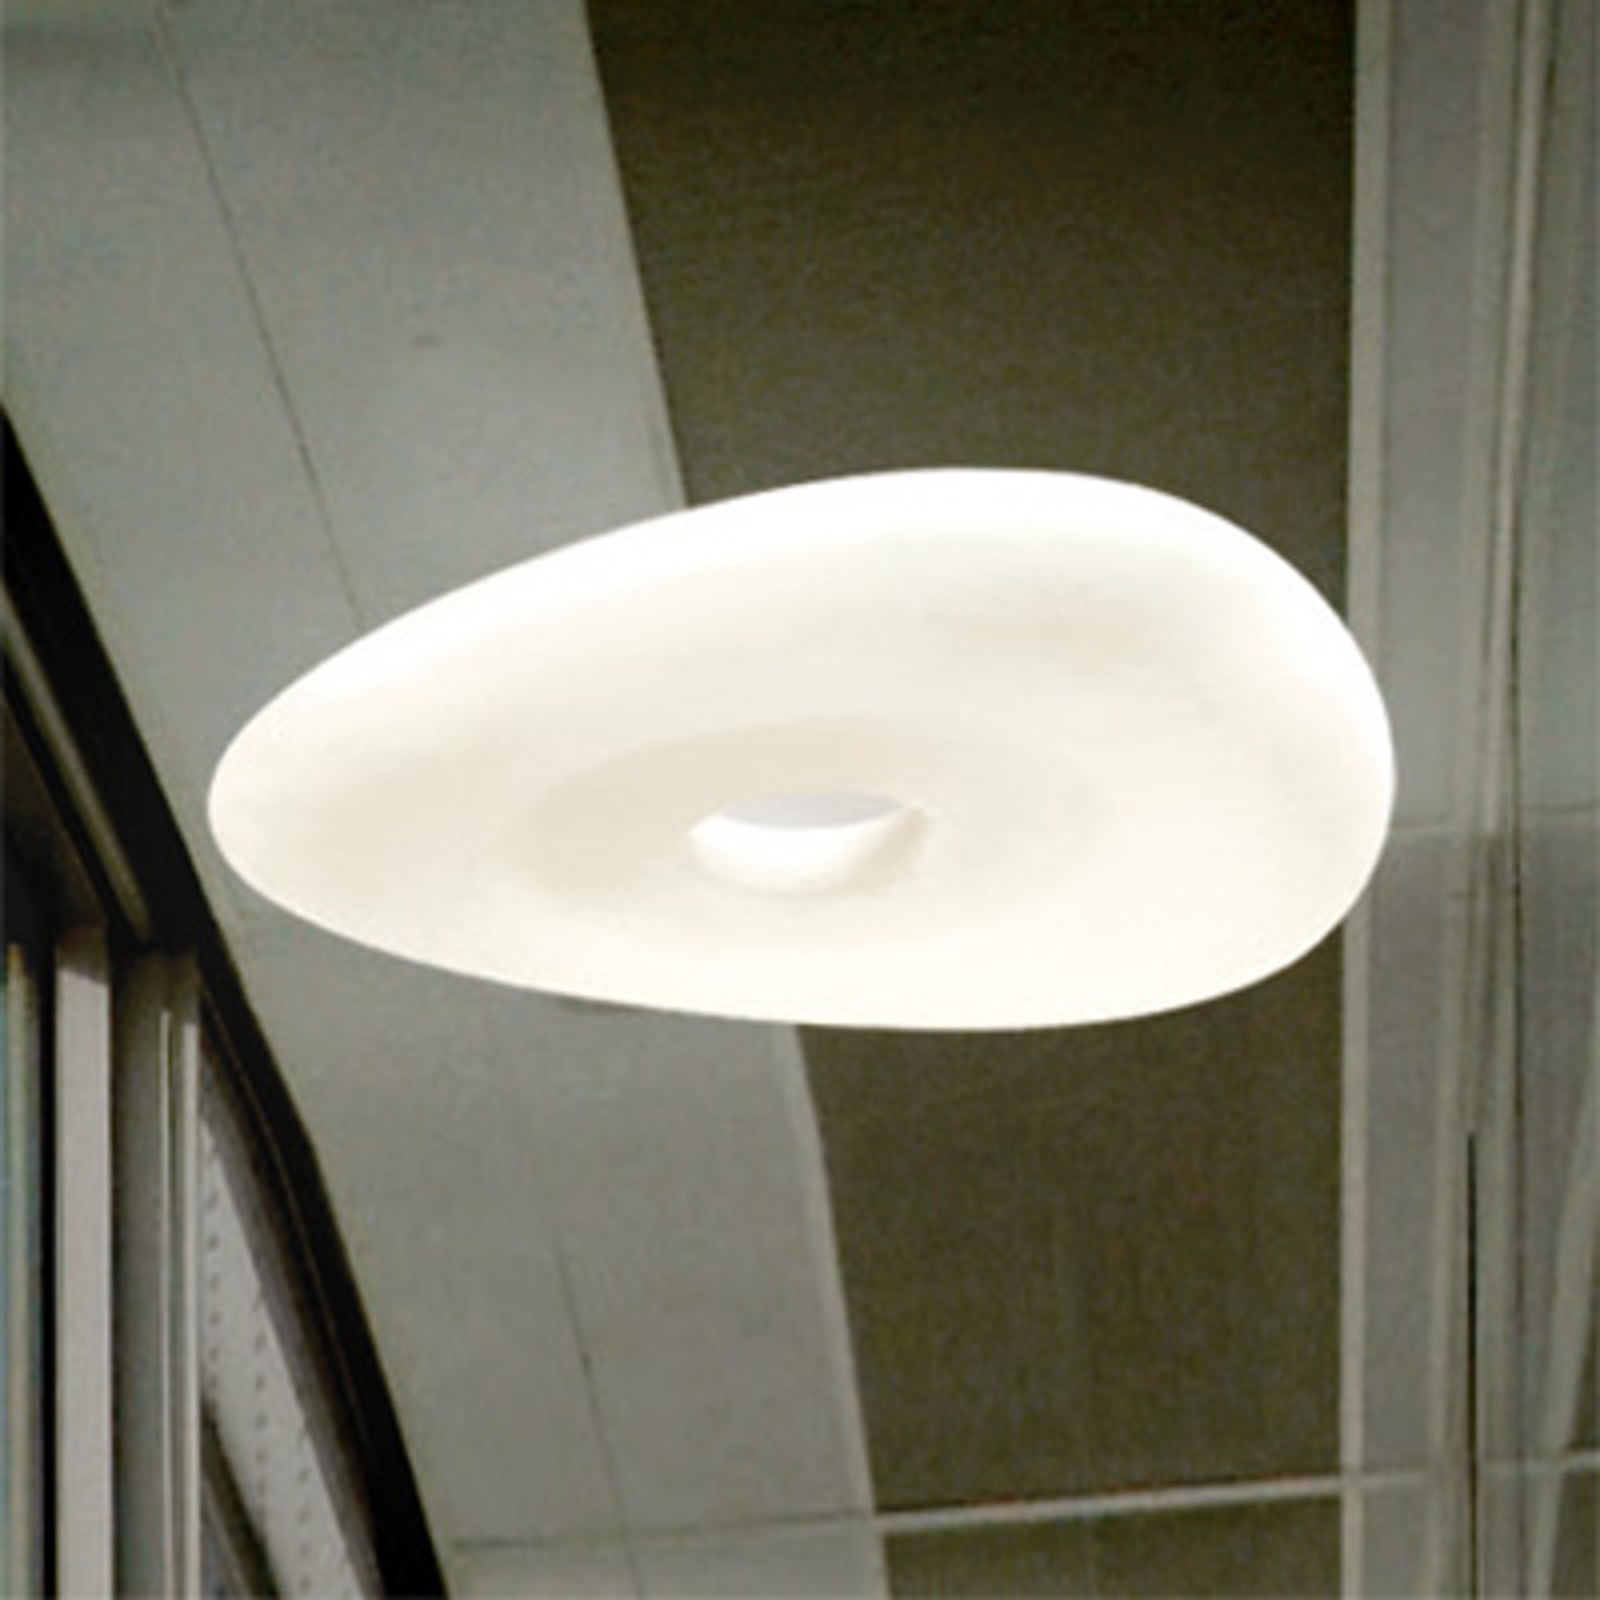 LED plafondlamp Mr. Magoo, 76 cm